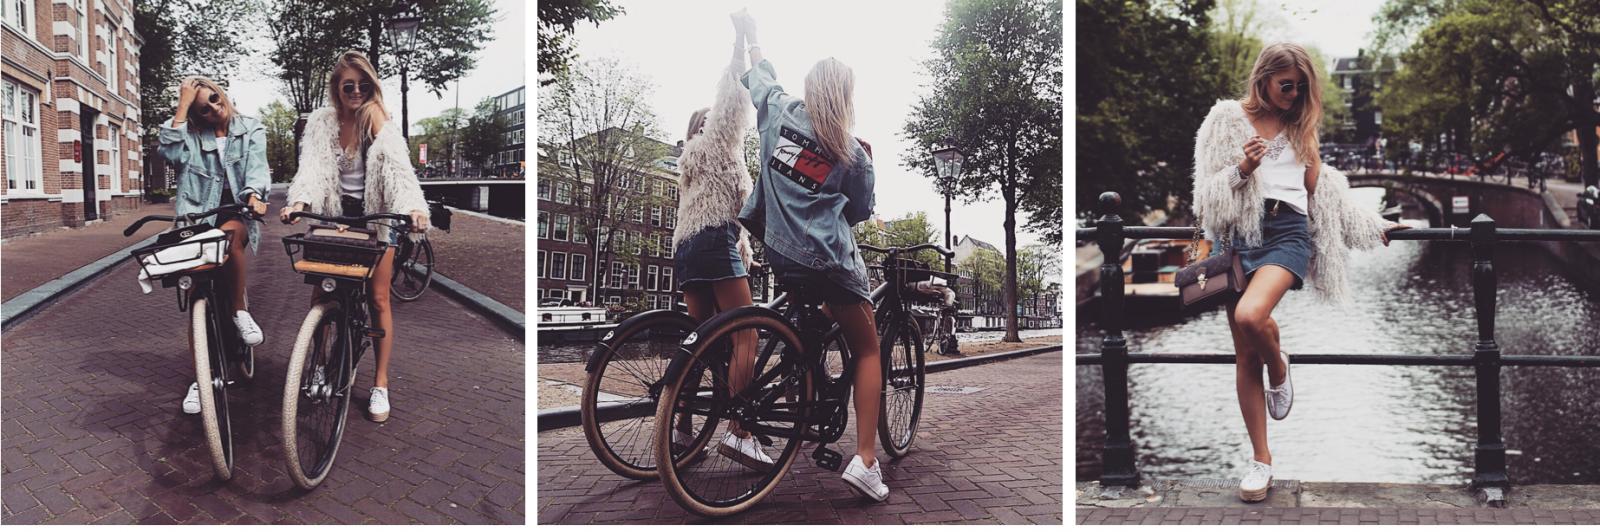 48 Hours In Amsterdam - Bike Ride